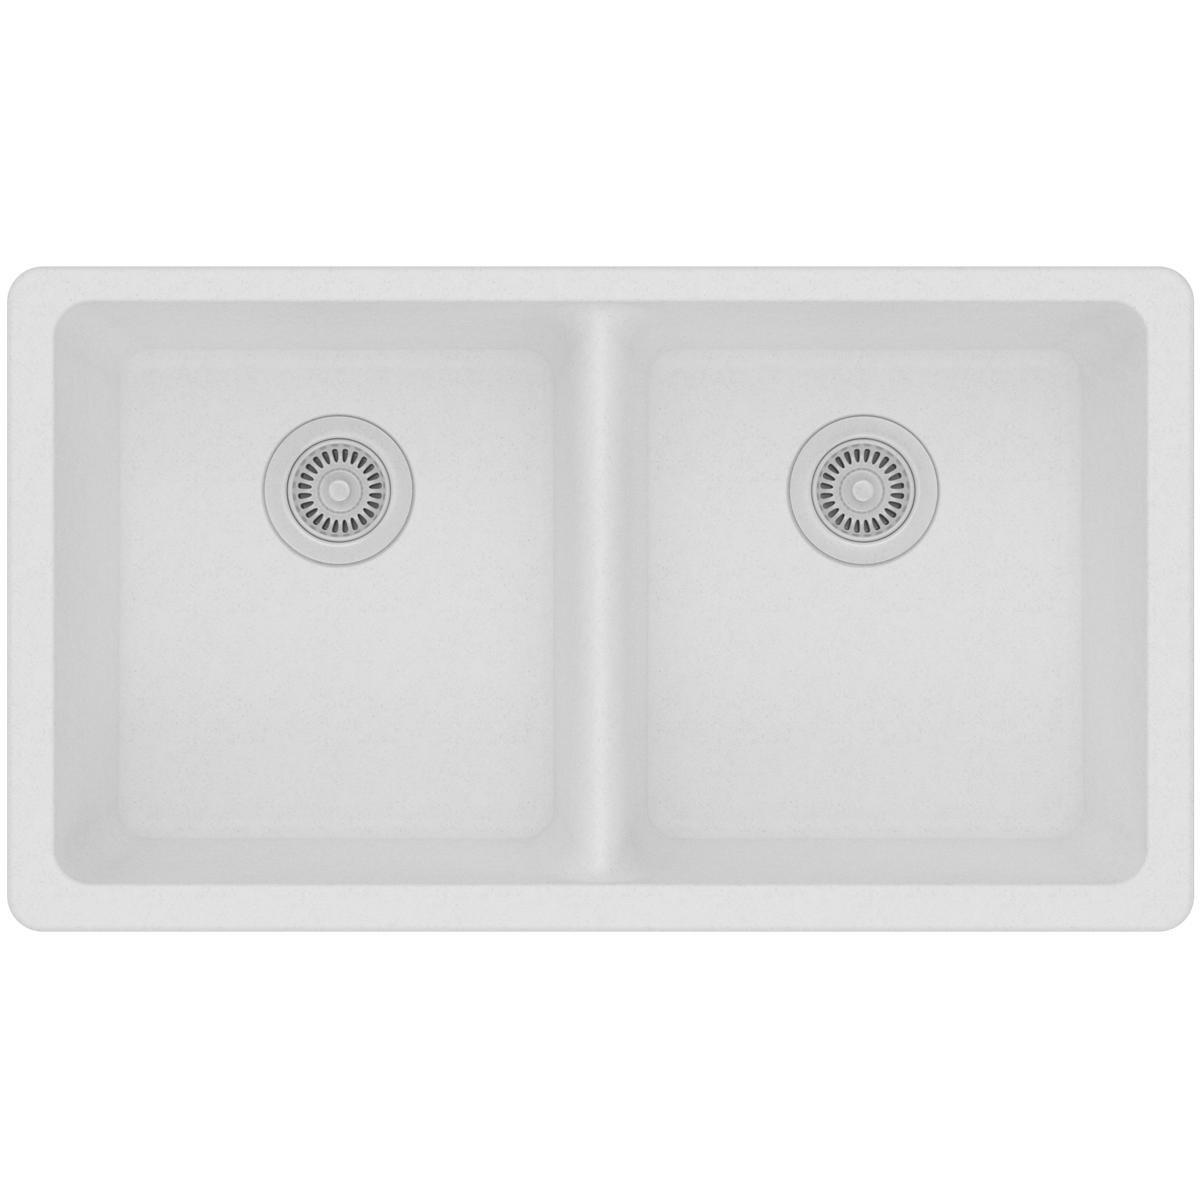 Elkay Quartz Classic ELGU3322MC0 Mocha Equal Double Bowl Undermount Sink